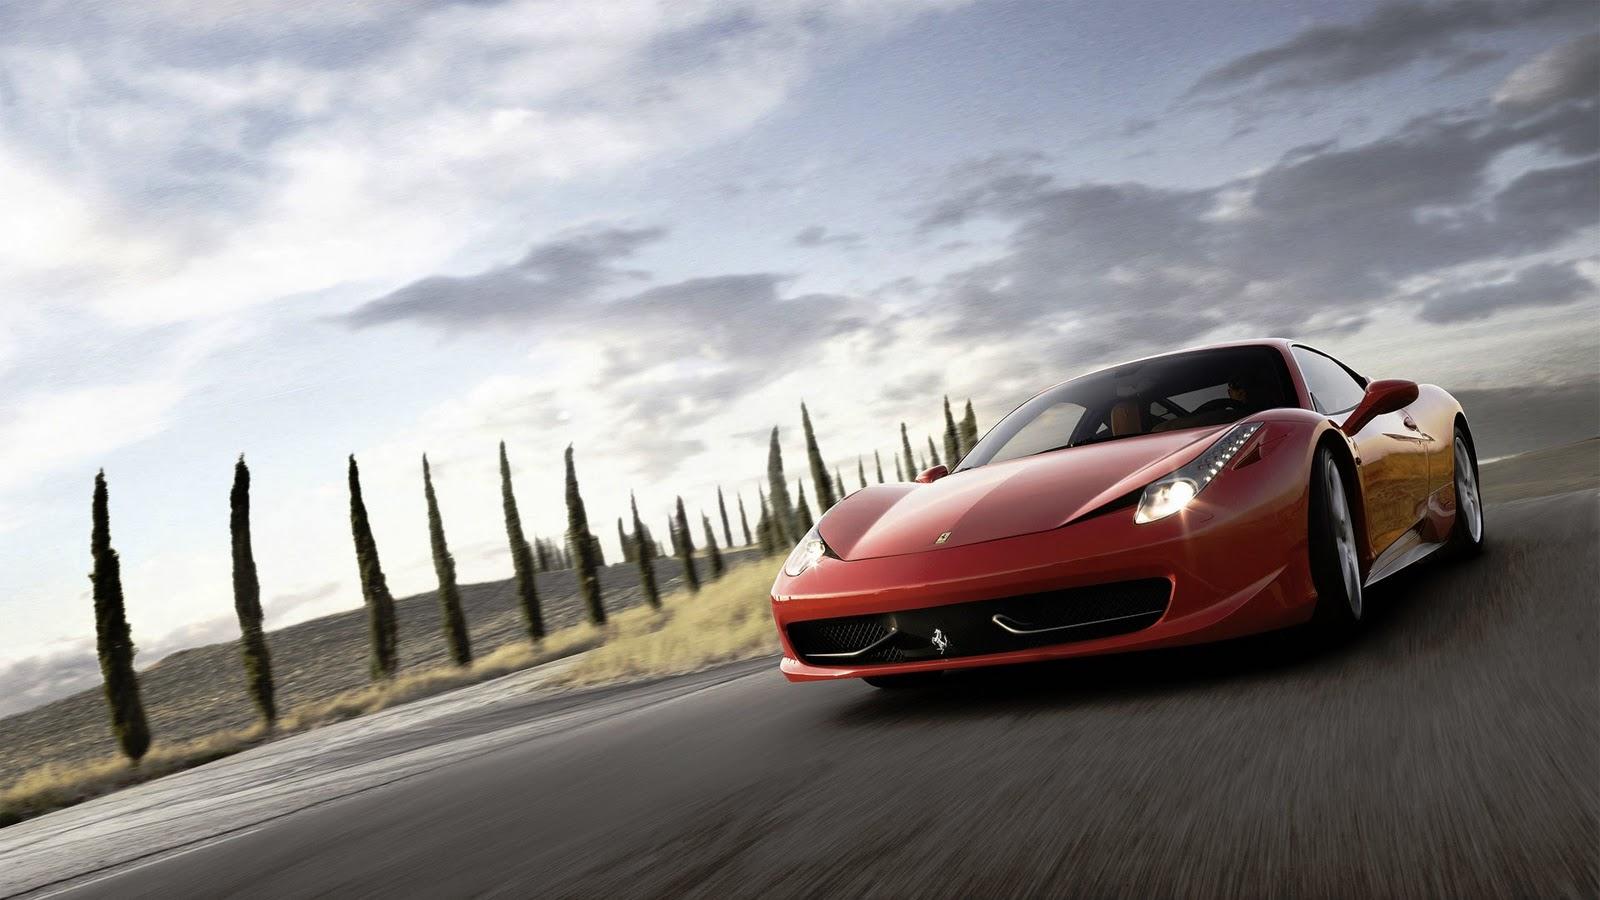 http://4.bp.blogspot.com/-sCL7LQrOR58/TqYY3_8-jxI/AAAAAAAAAnY/p-xRsYlC1Uk/s1600/Ferrari_458_Italiax_2011_02.jpg